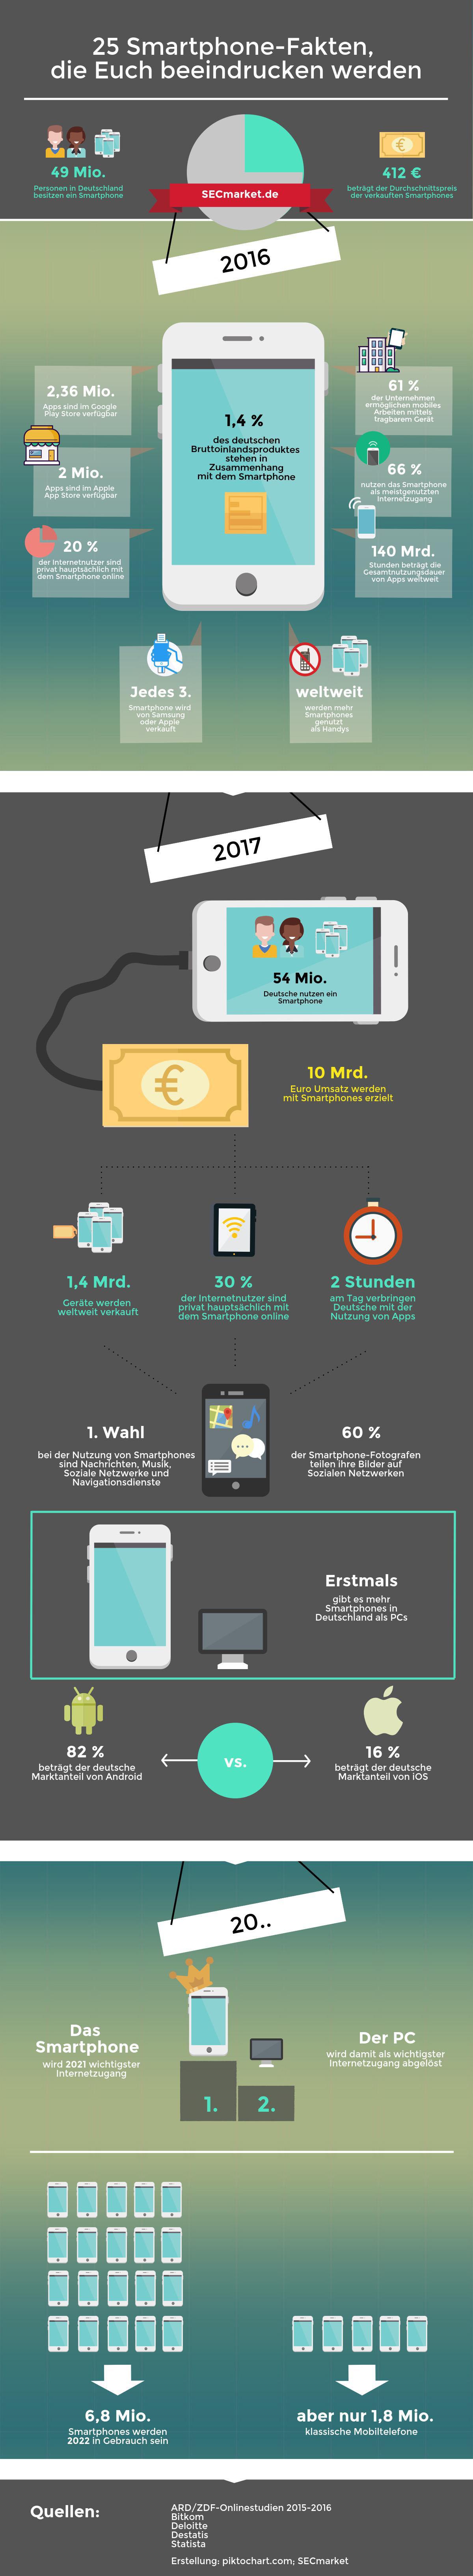 Secmarket - 25 Smartphone Fakten